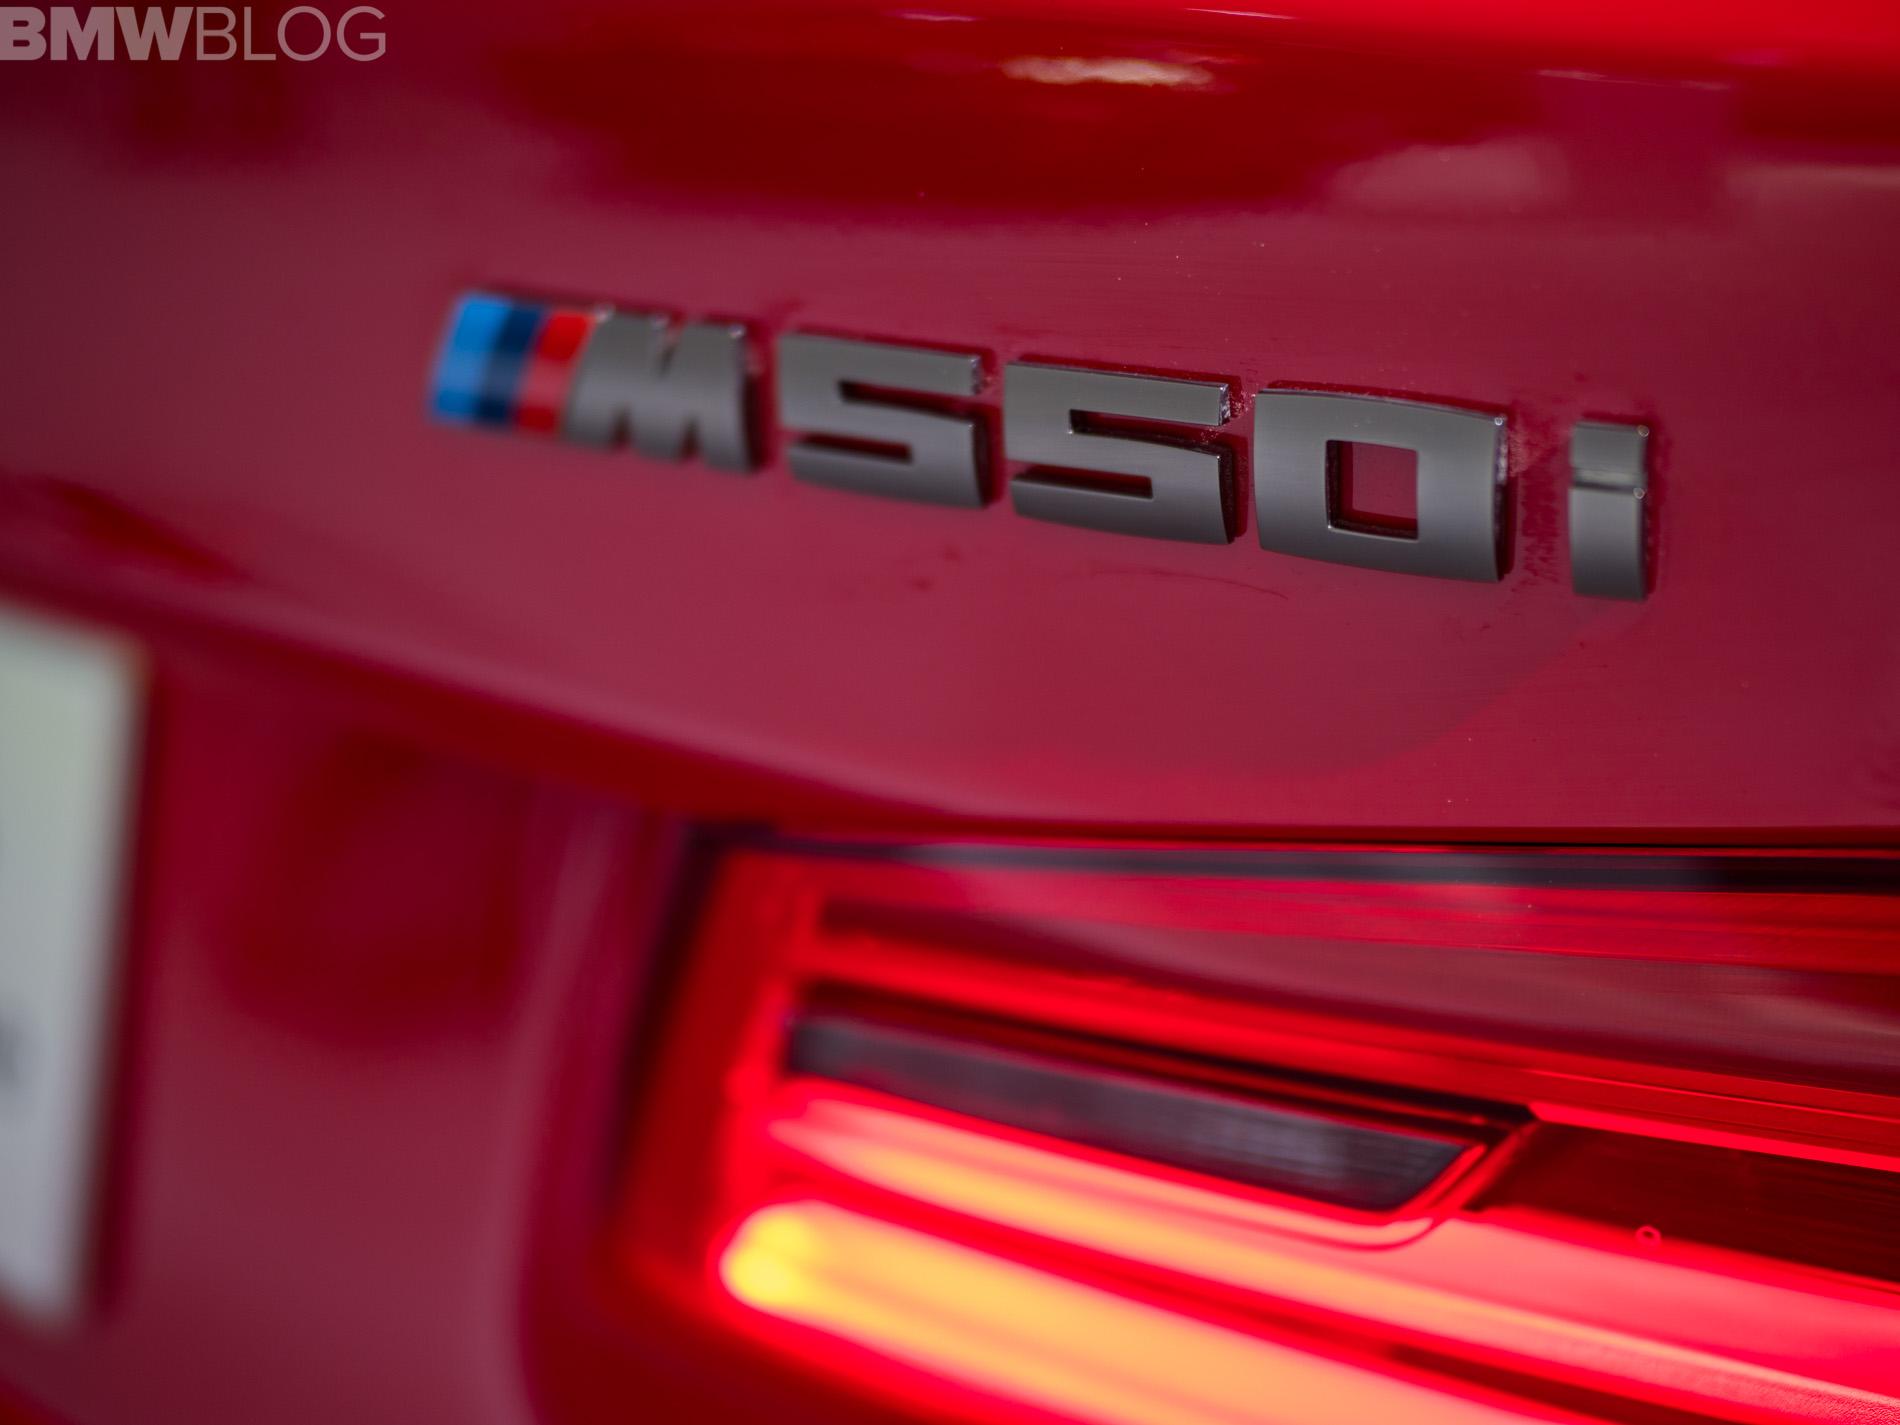 BMW M550i Ferrari Red 5